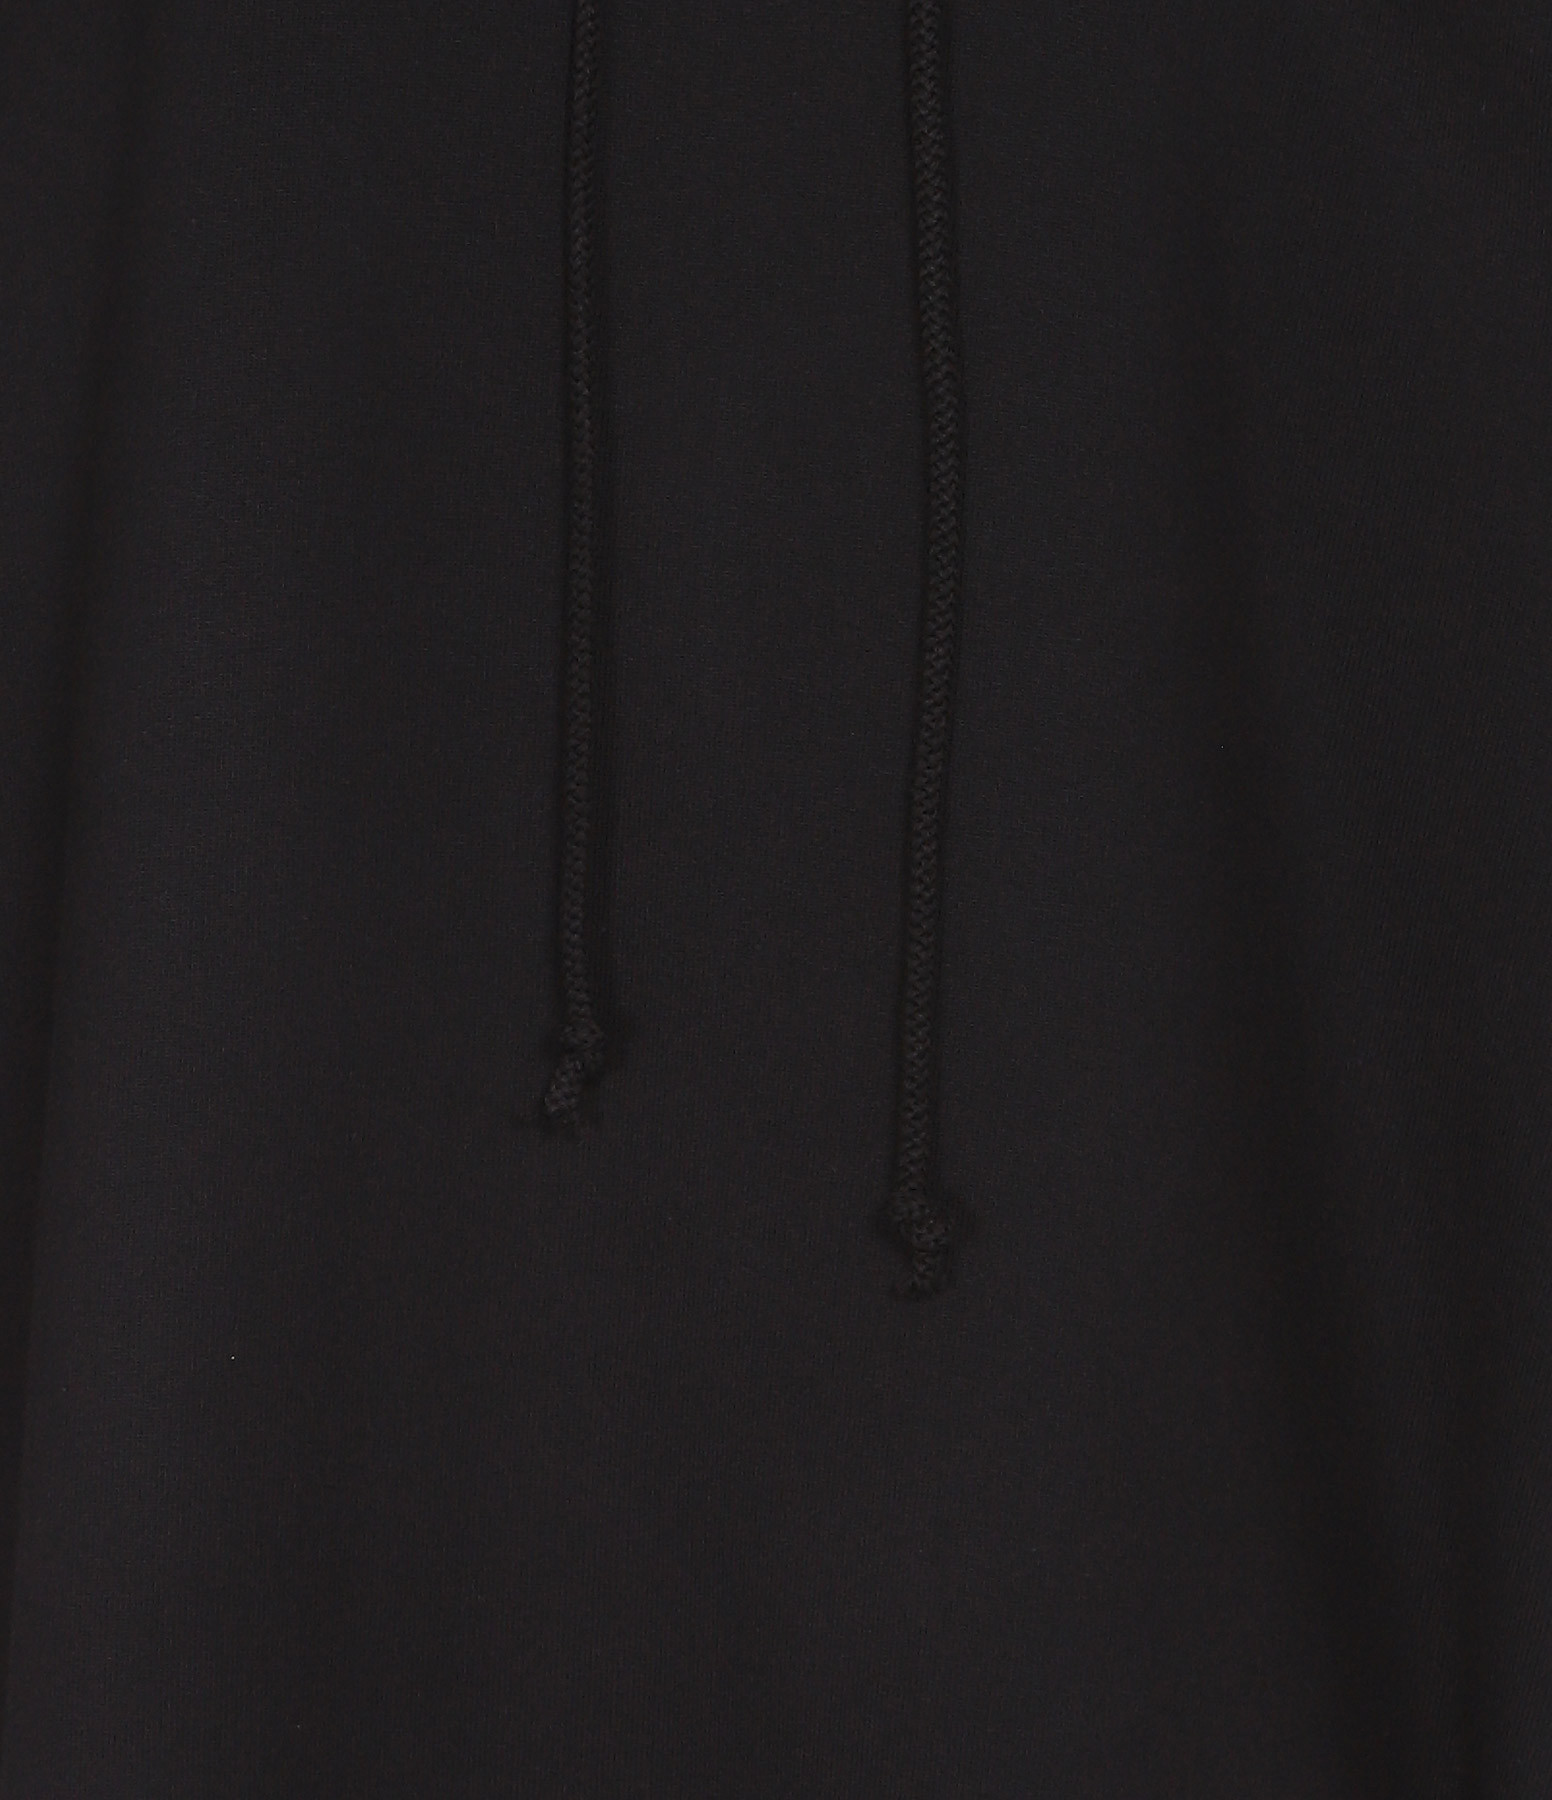 MM6 MAISON MARGIELA - Robe Sweatshirt Noir